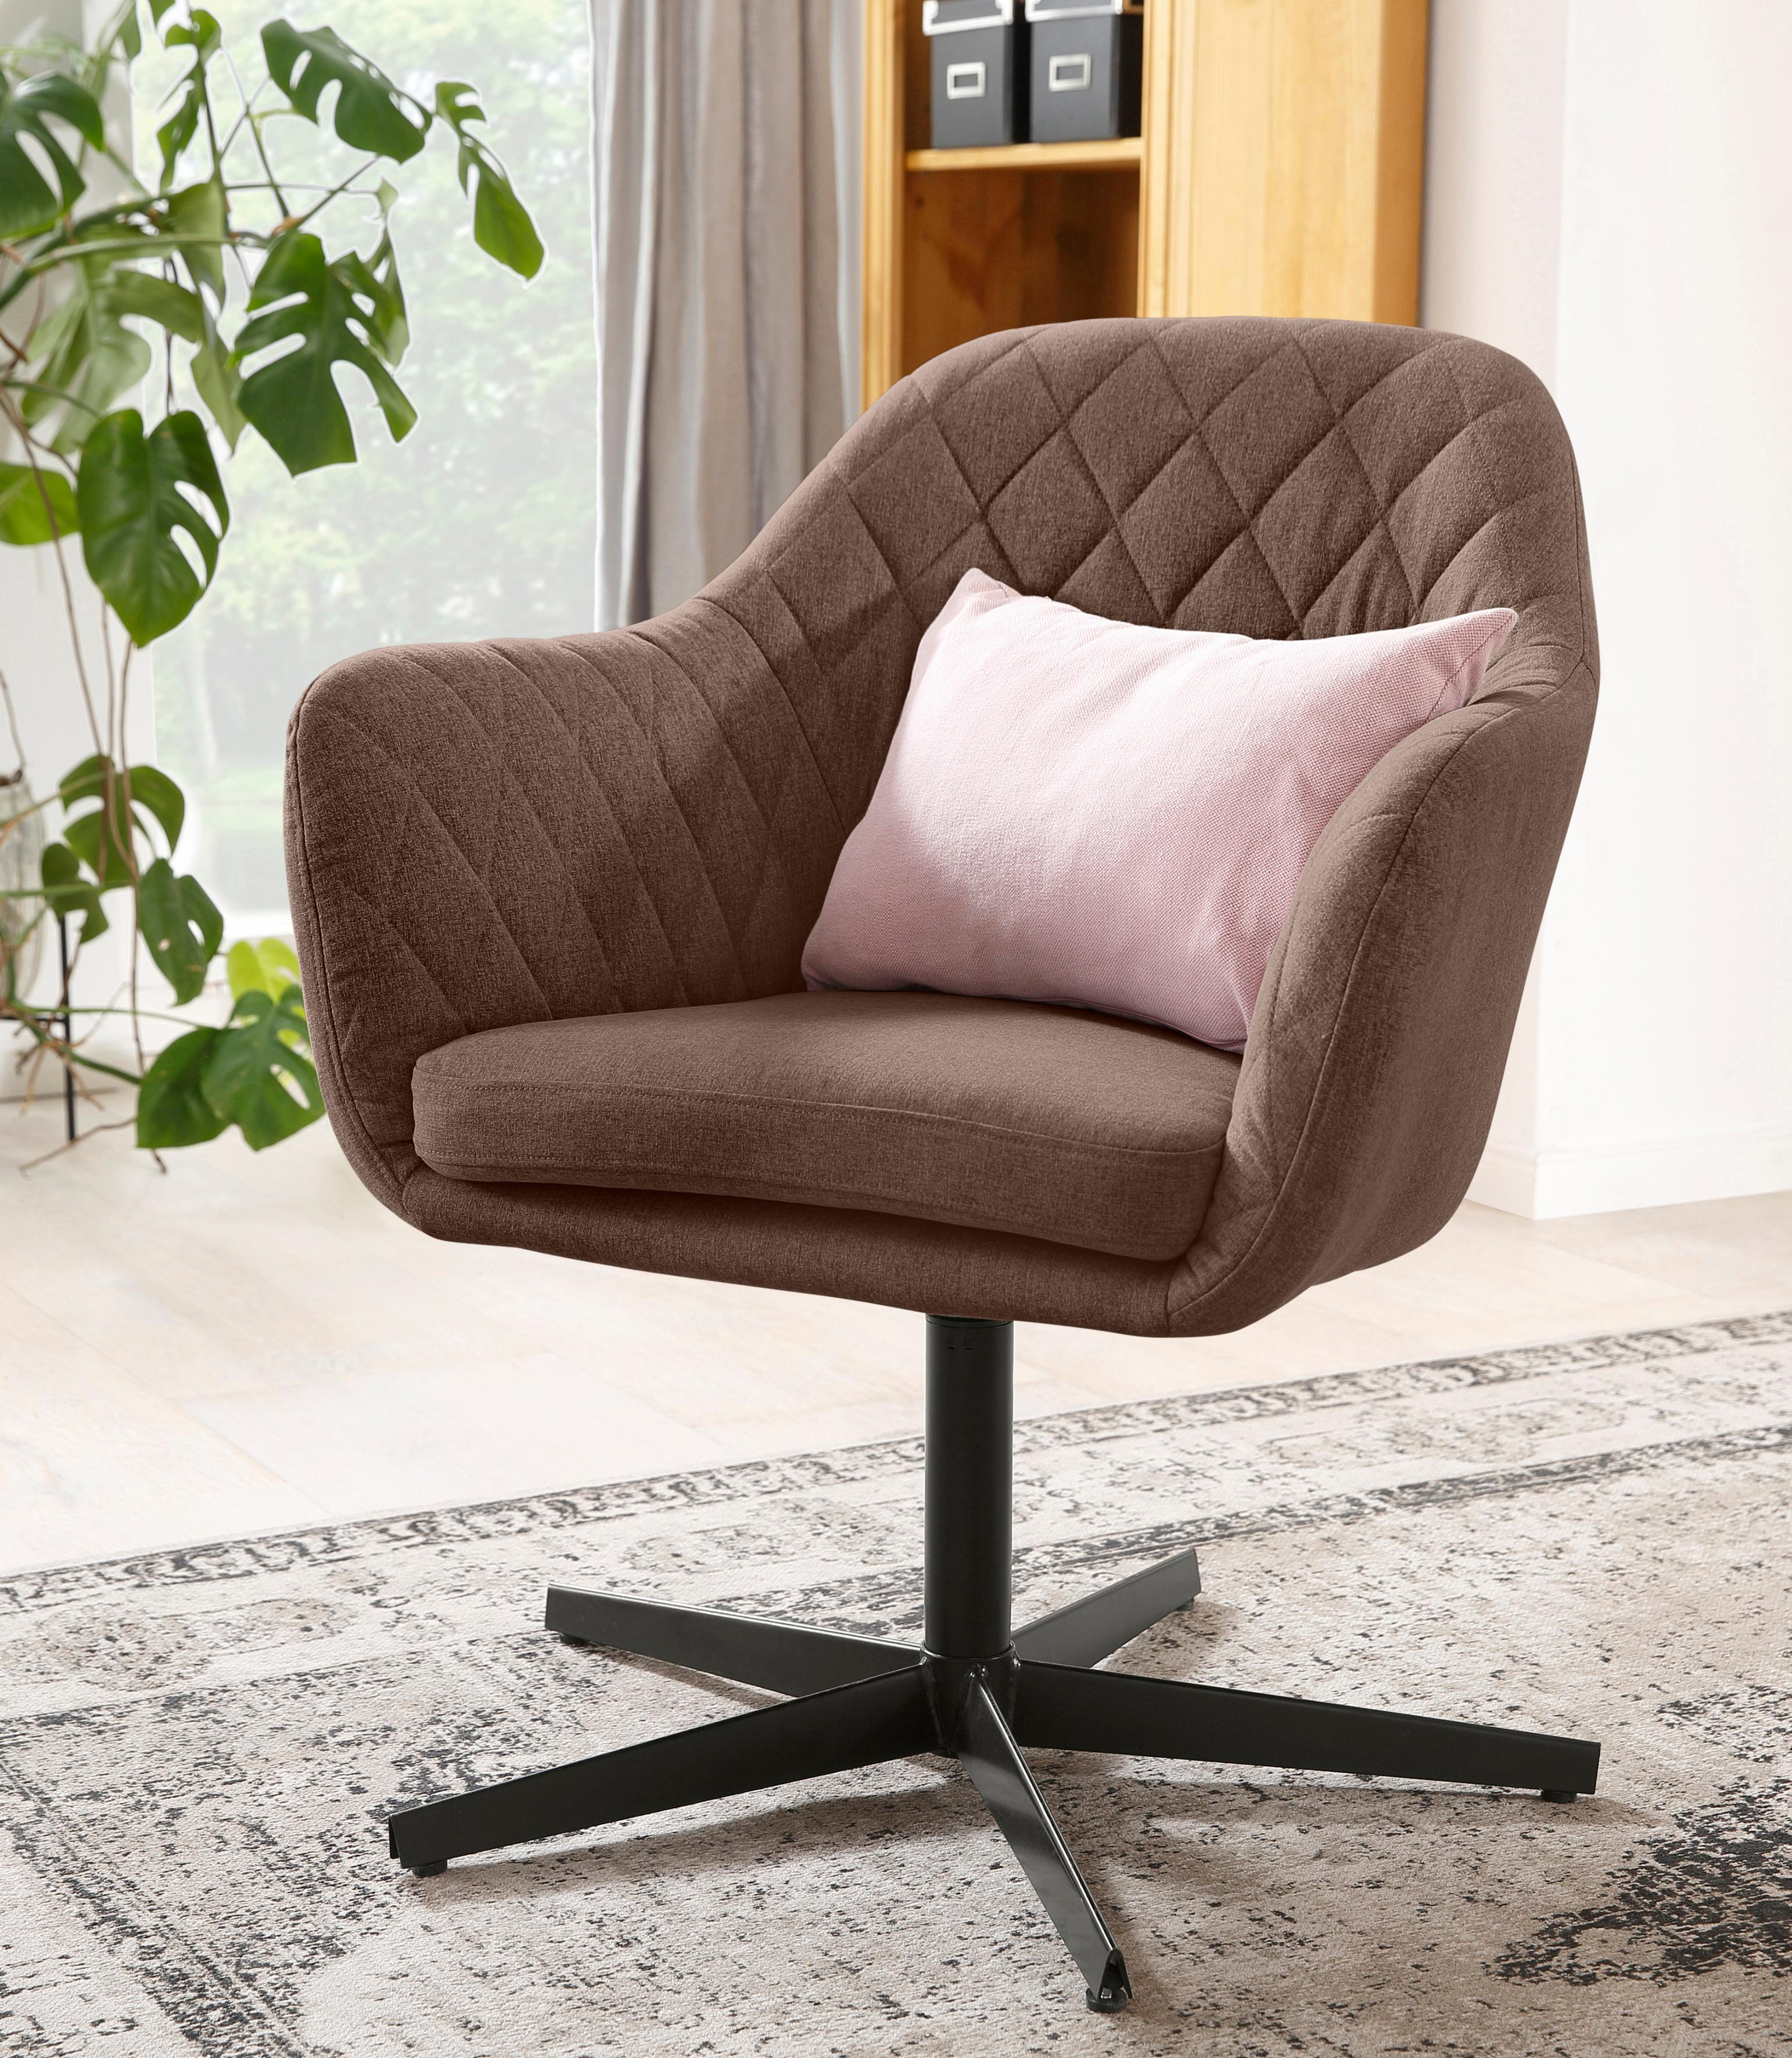 Home affaire Lounge-Sessel Alabama mit Metallgestell drehbar